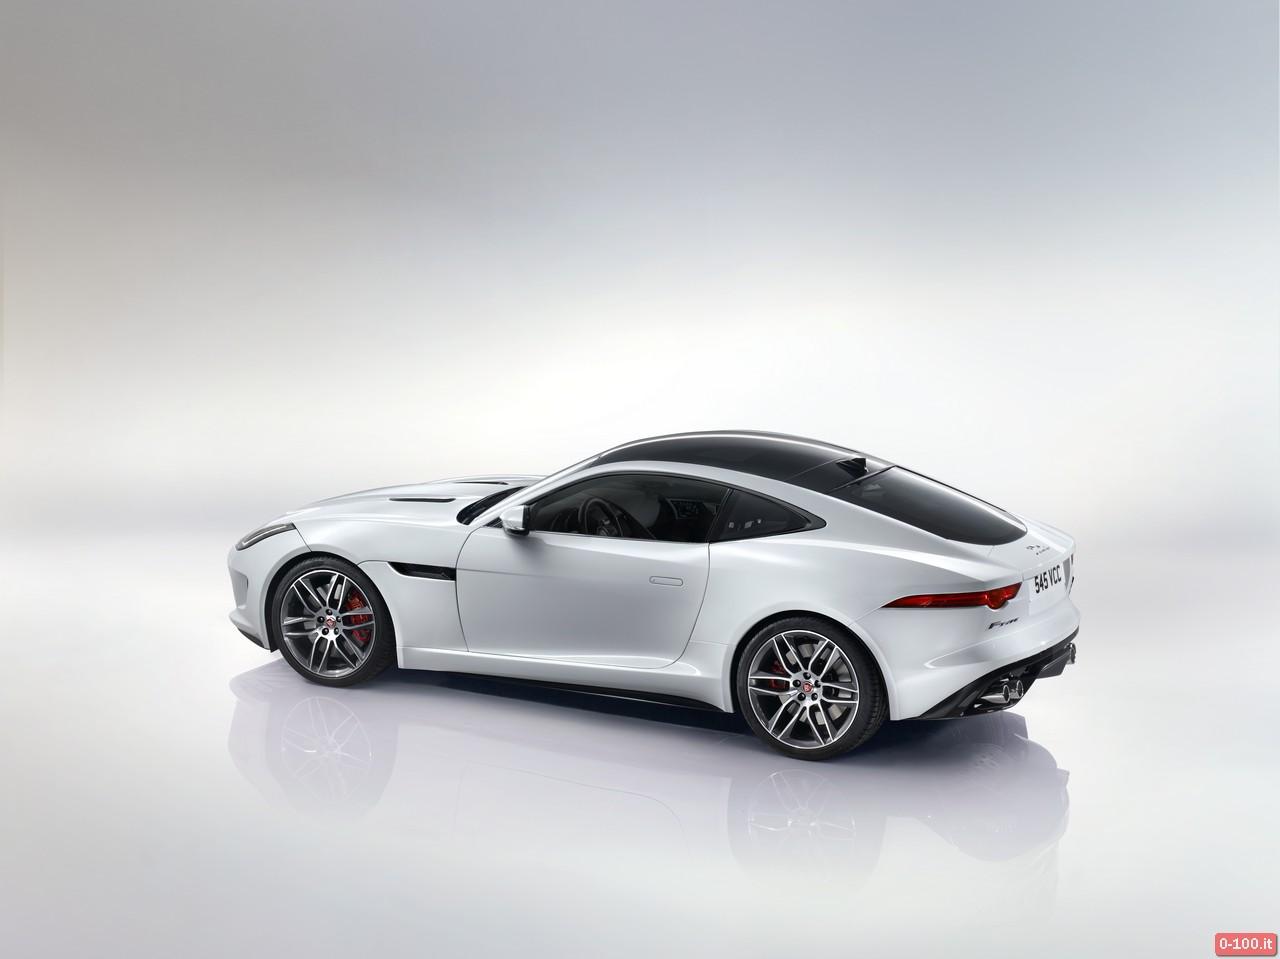 jaguar-f-type-r-coupe_price-prezzo-0-100_7